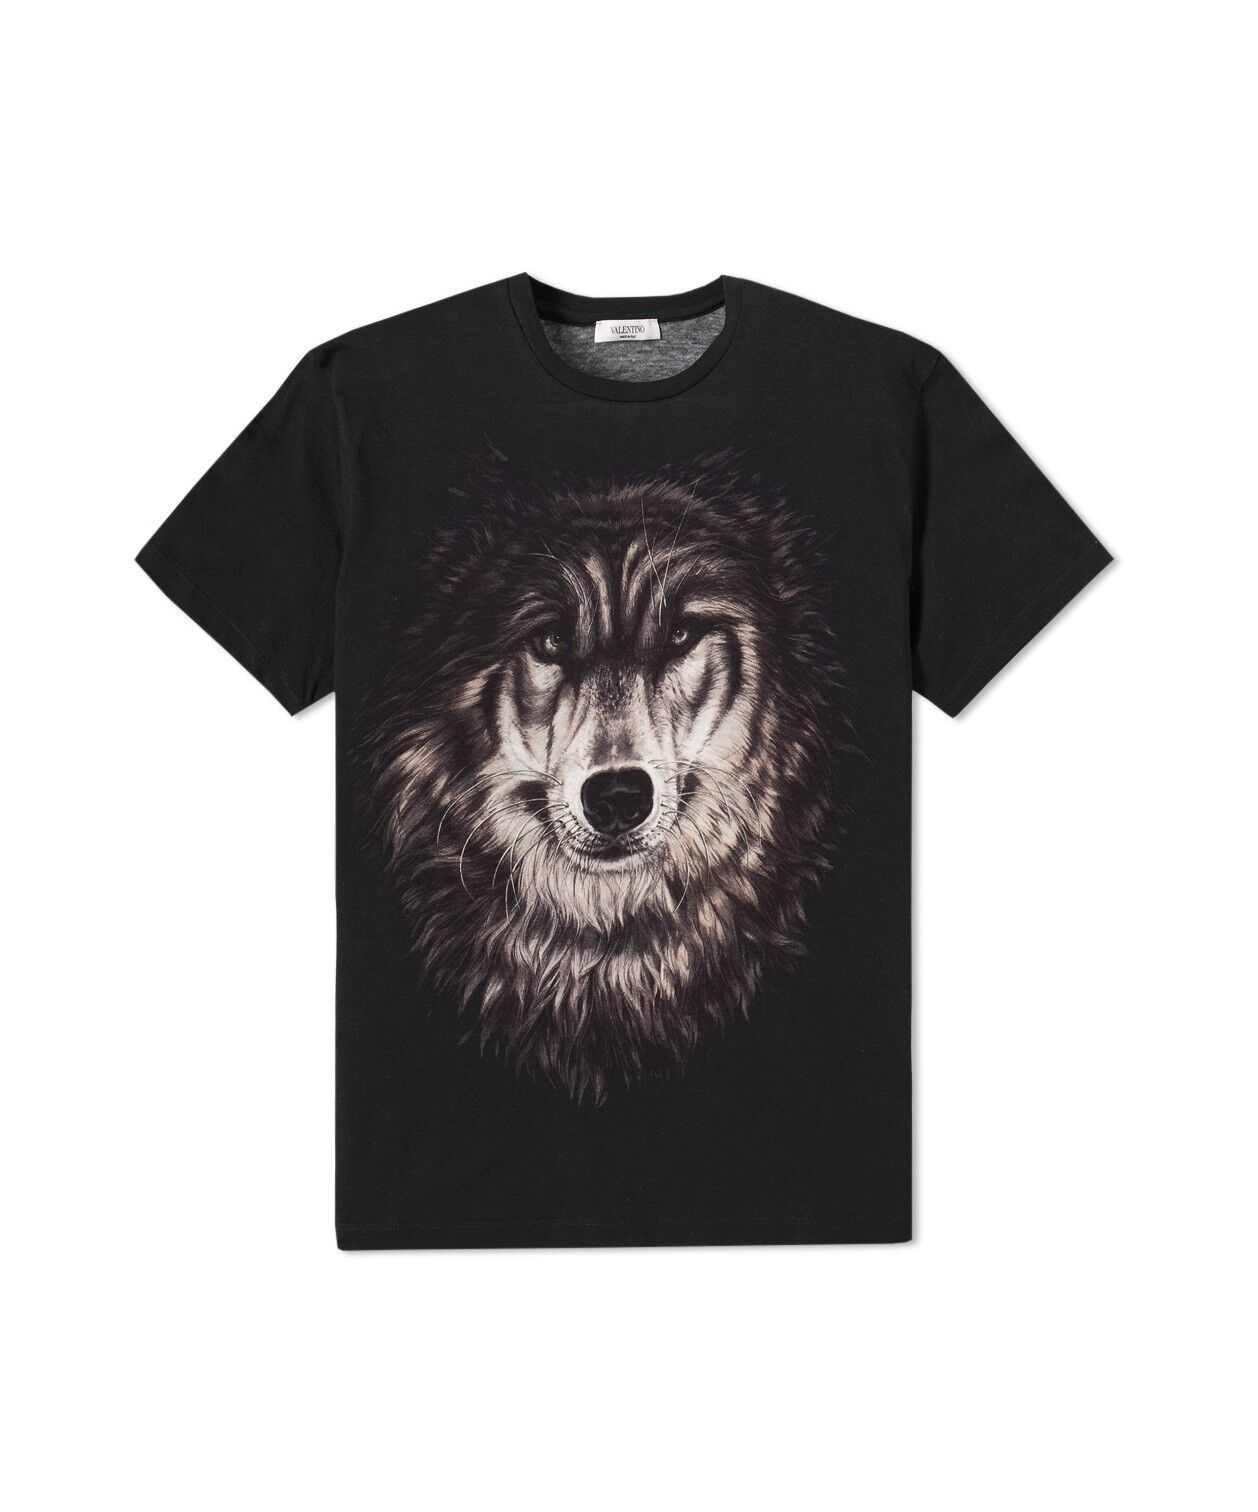 Valentino Wolf T-shirt, Größes Large & XL - BNWT,